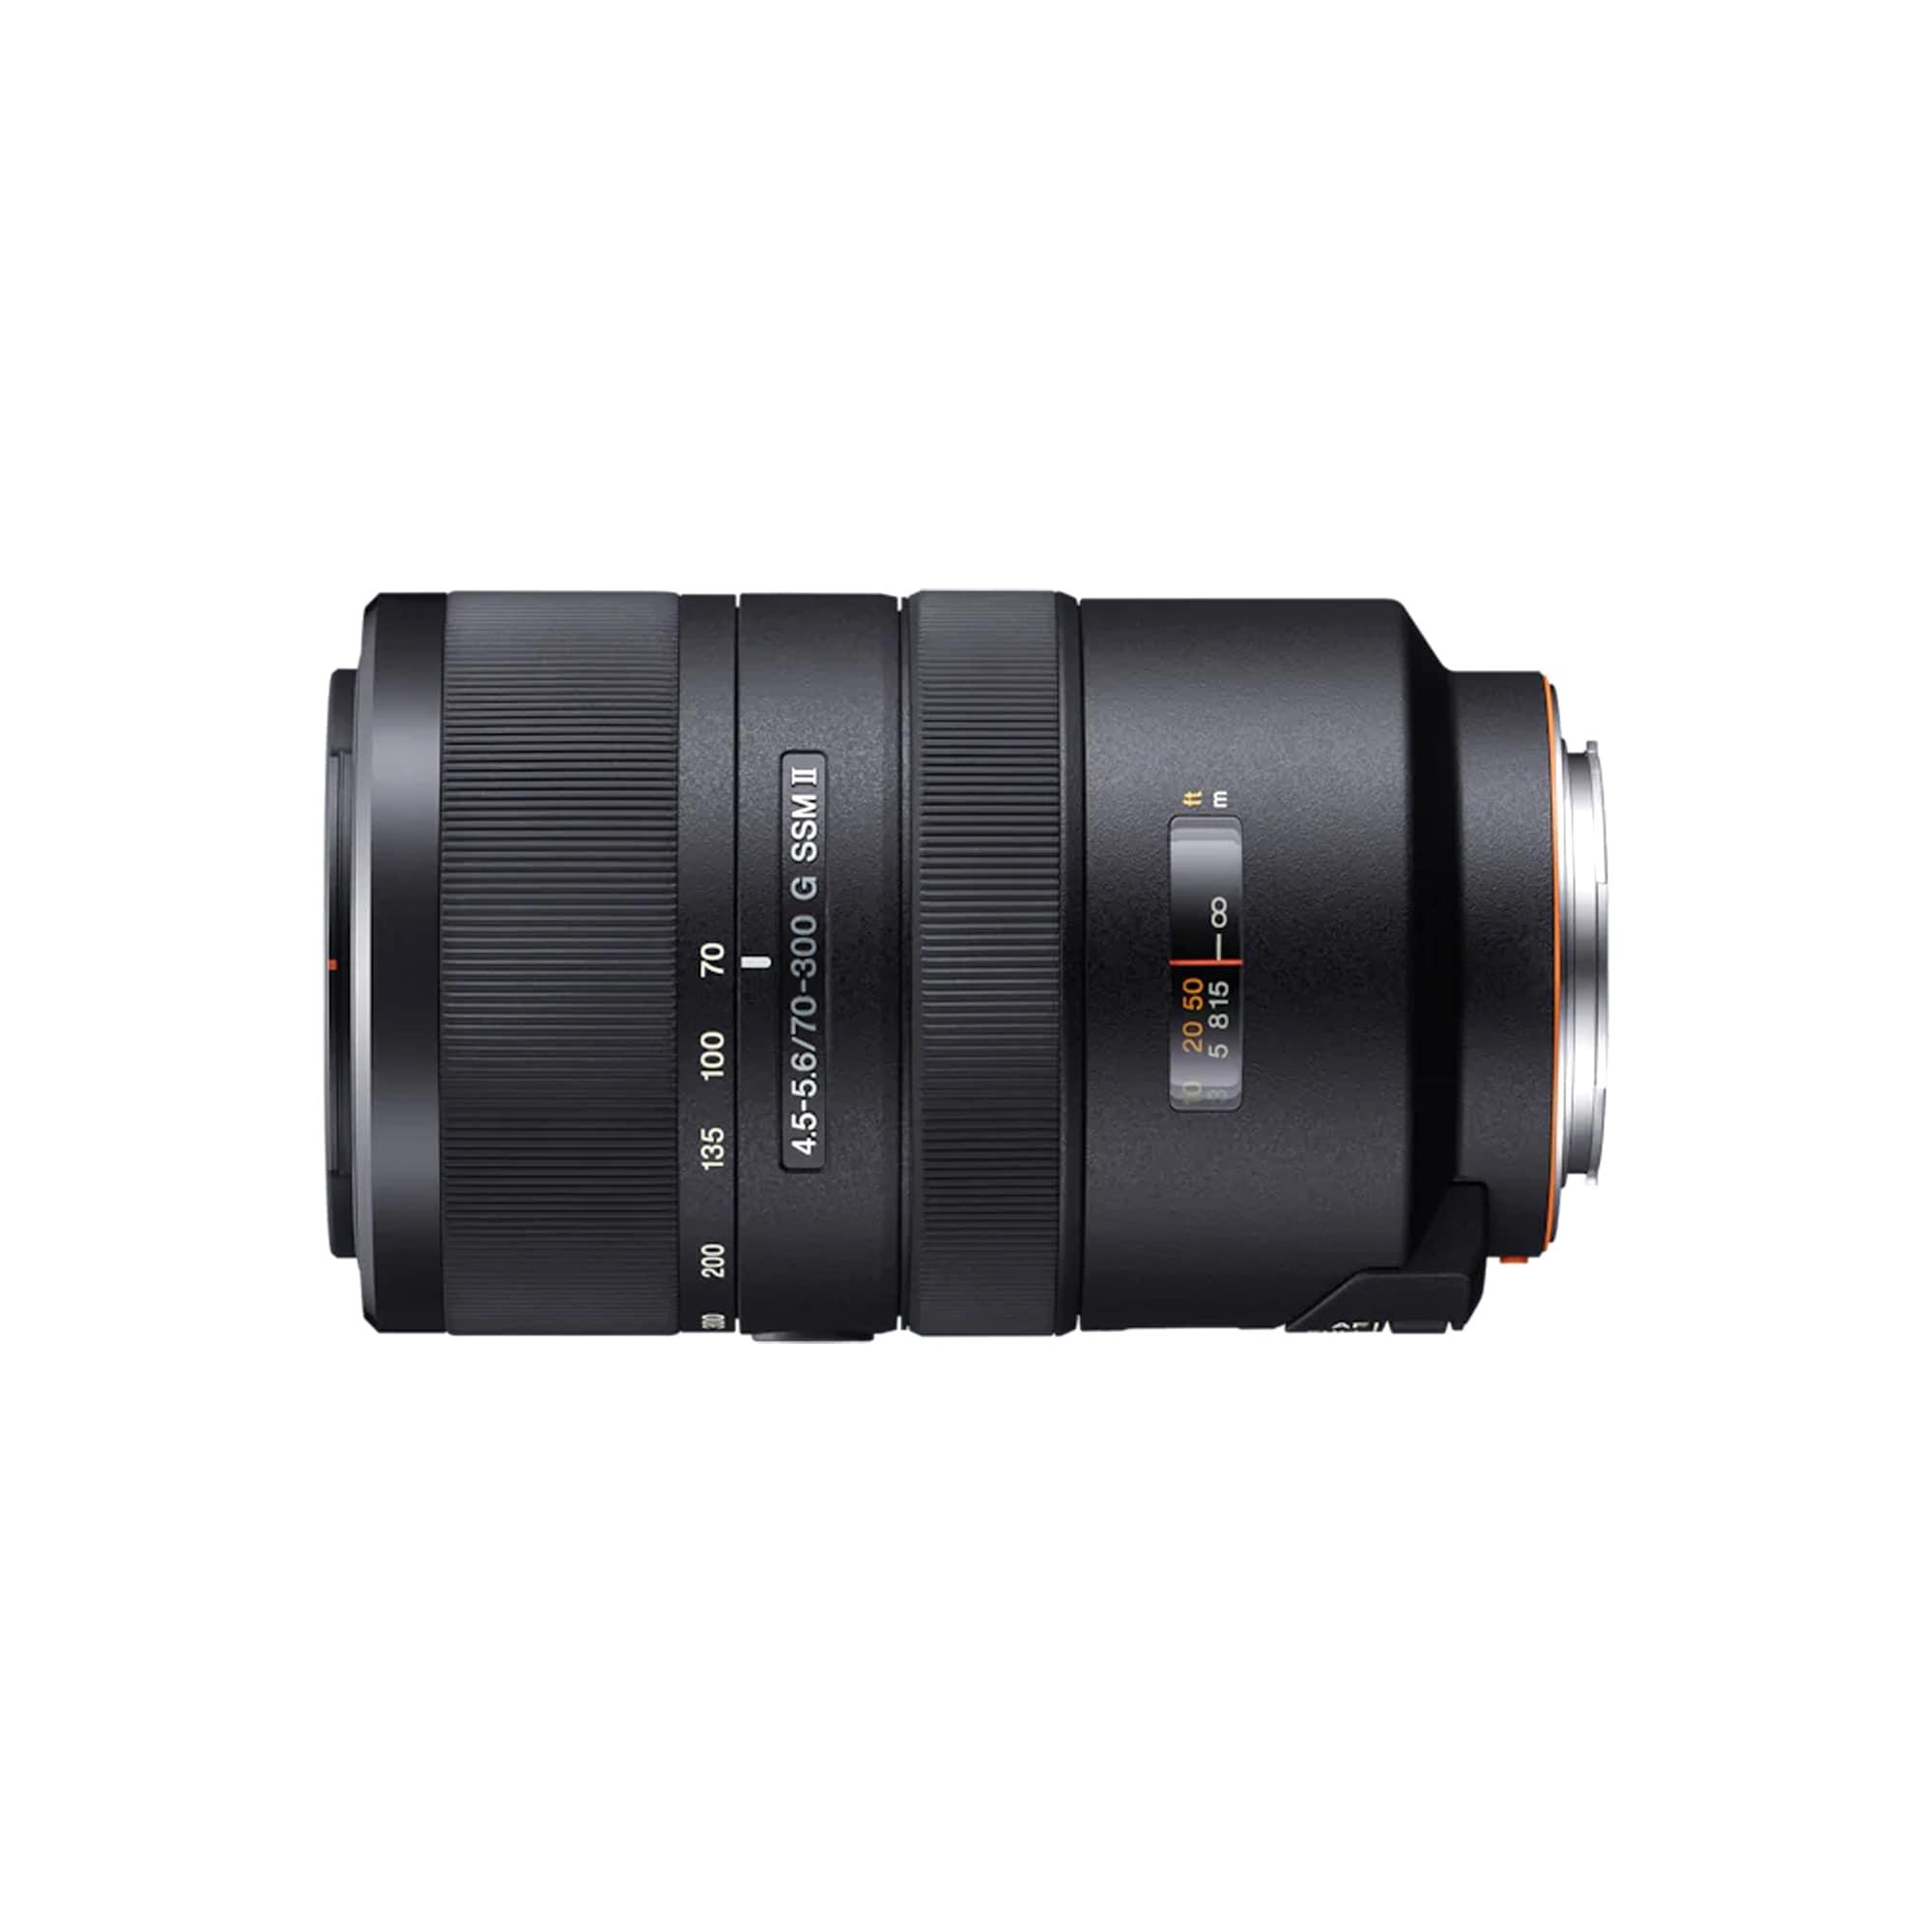 Sony 70-300mm f/4,5-5,6 G SSM II